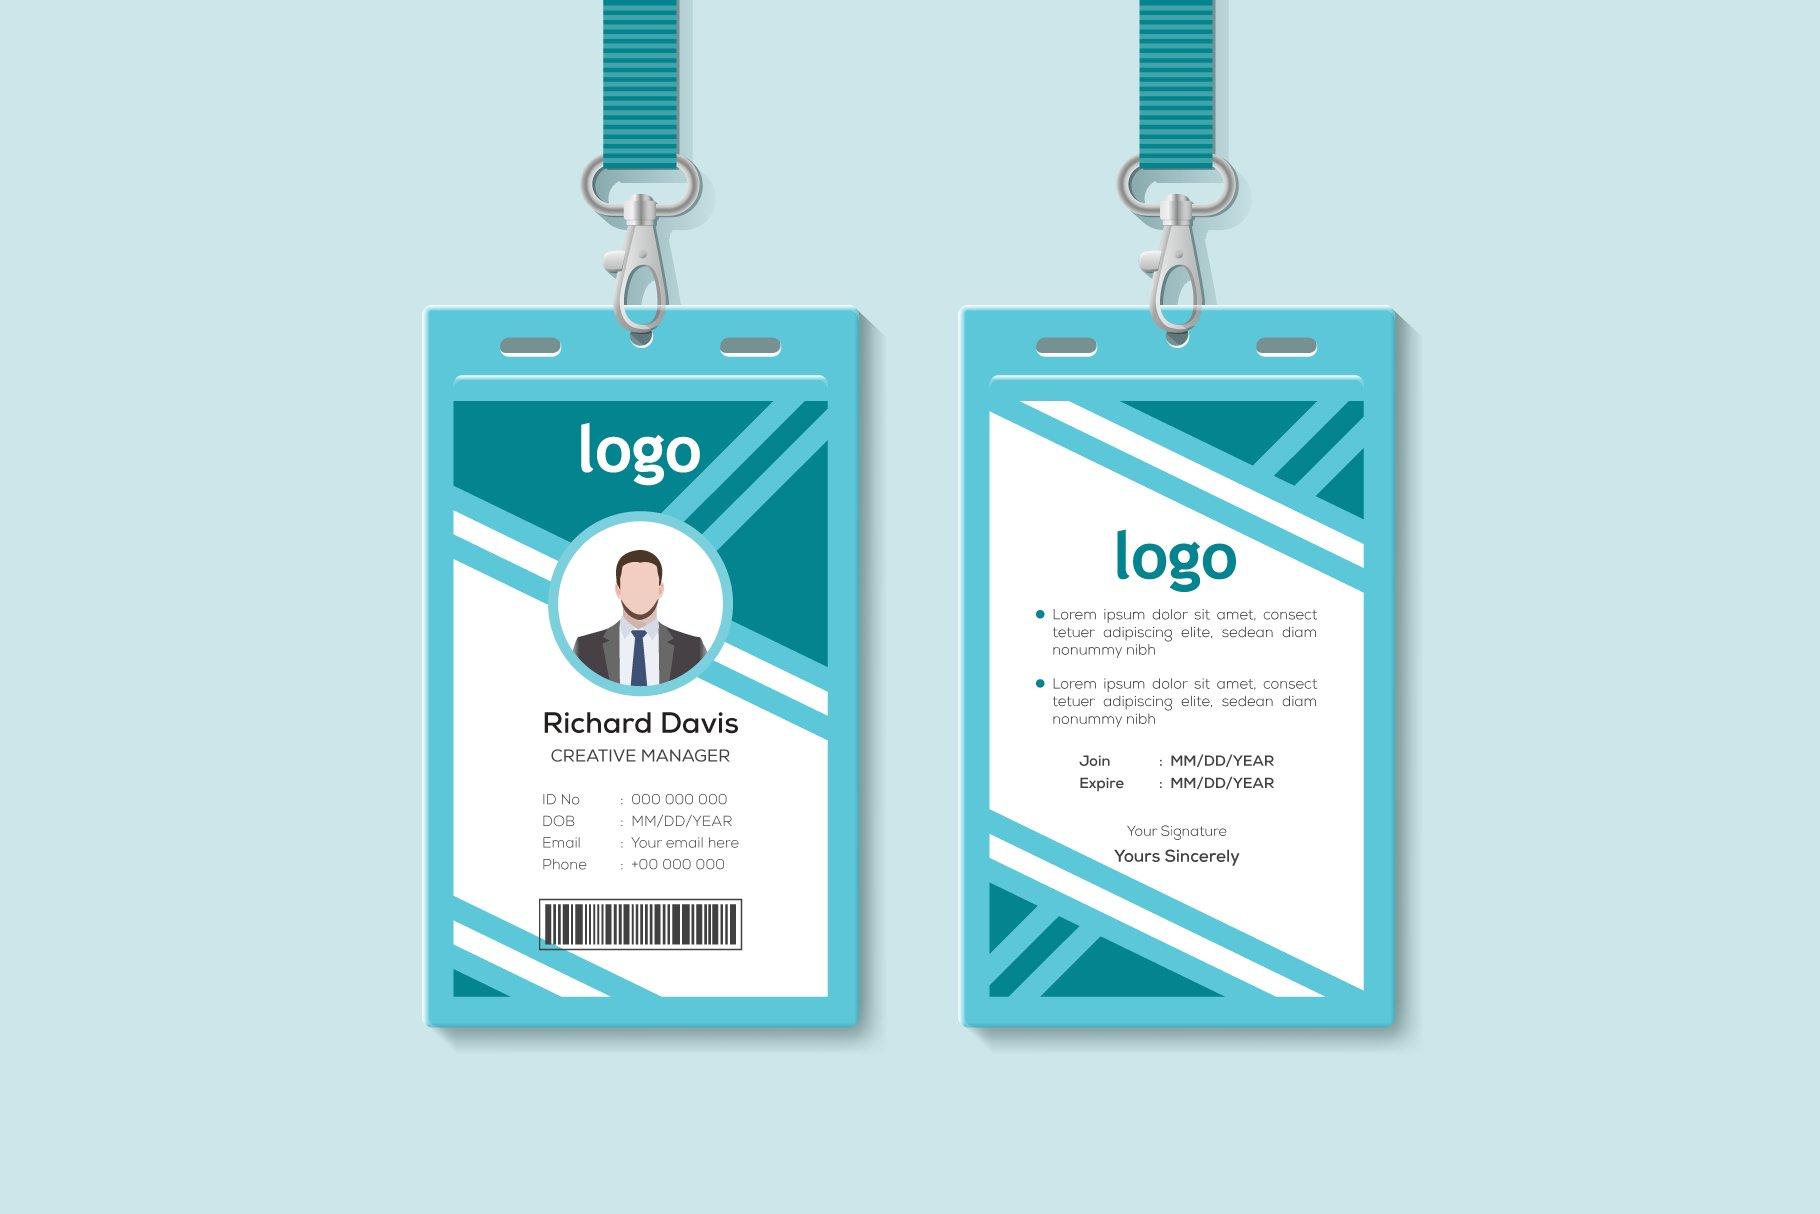 Corporate ID Card Design Template  Creative Daddy For Company Id Card Design Template